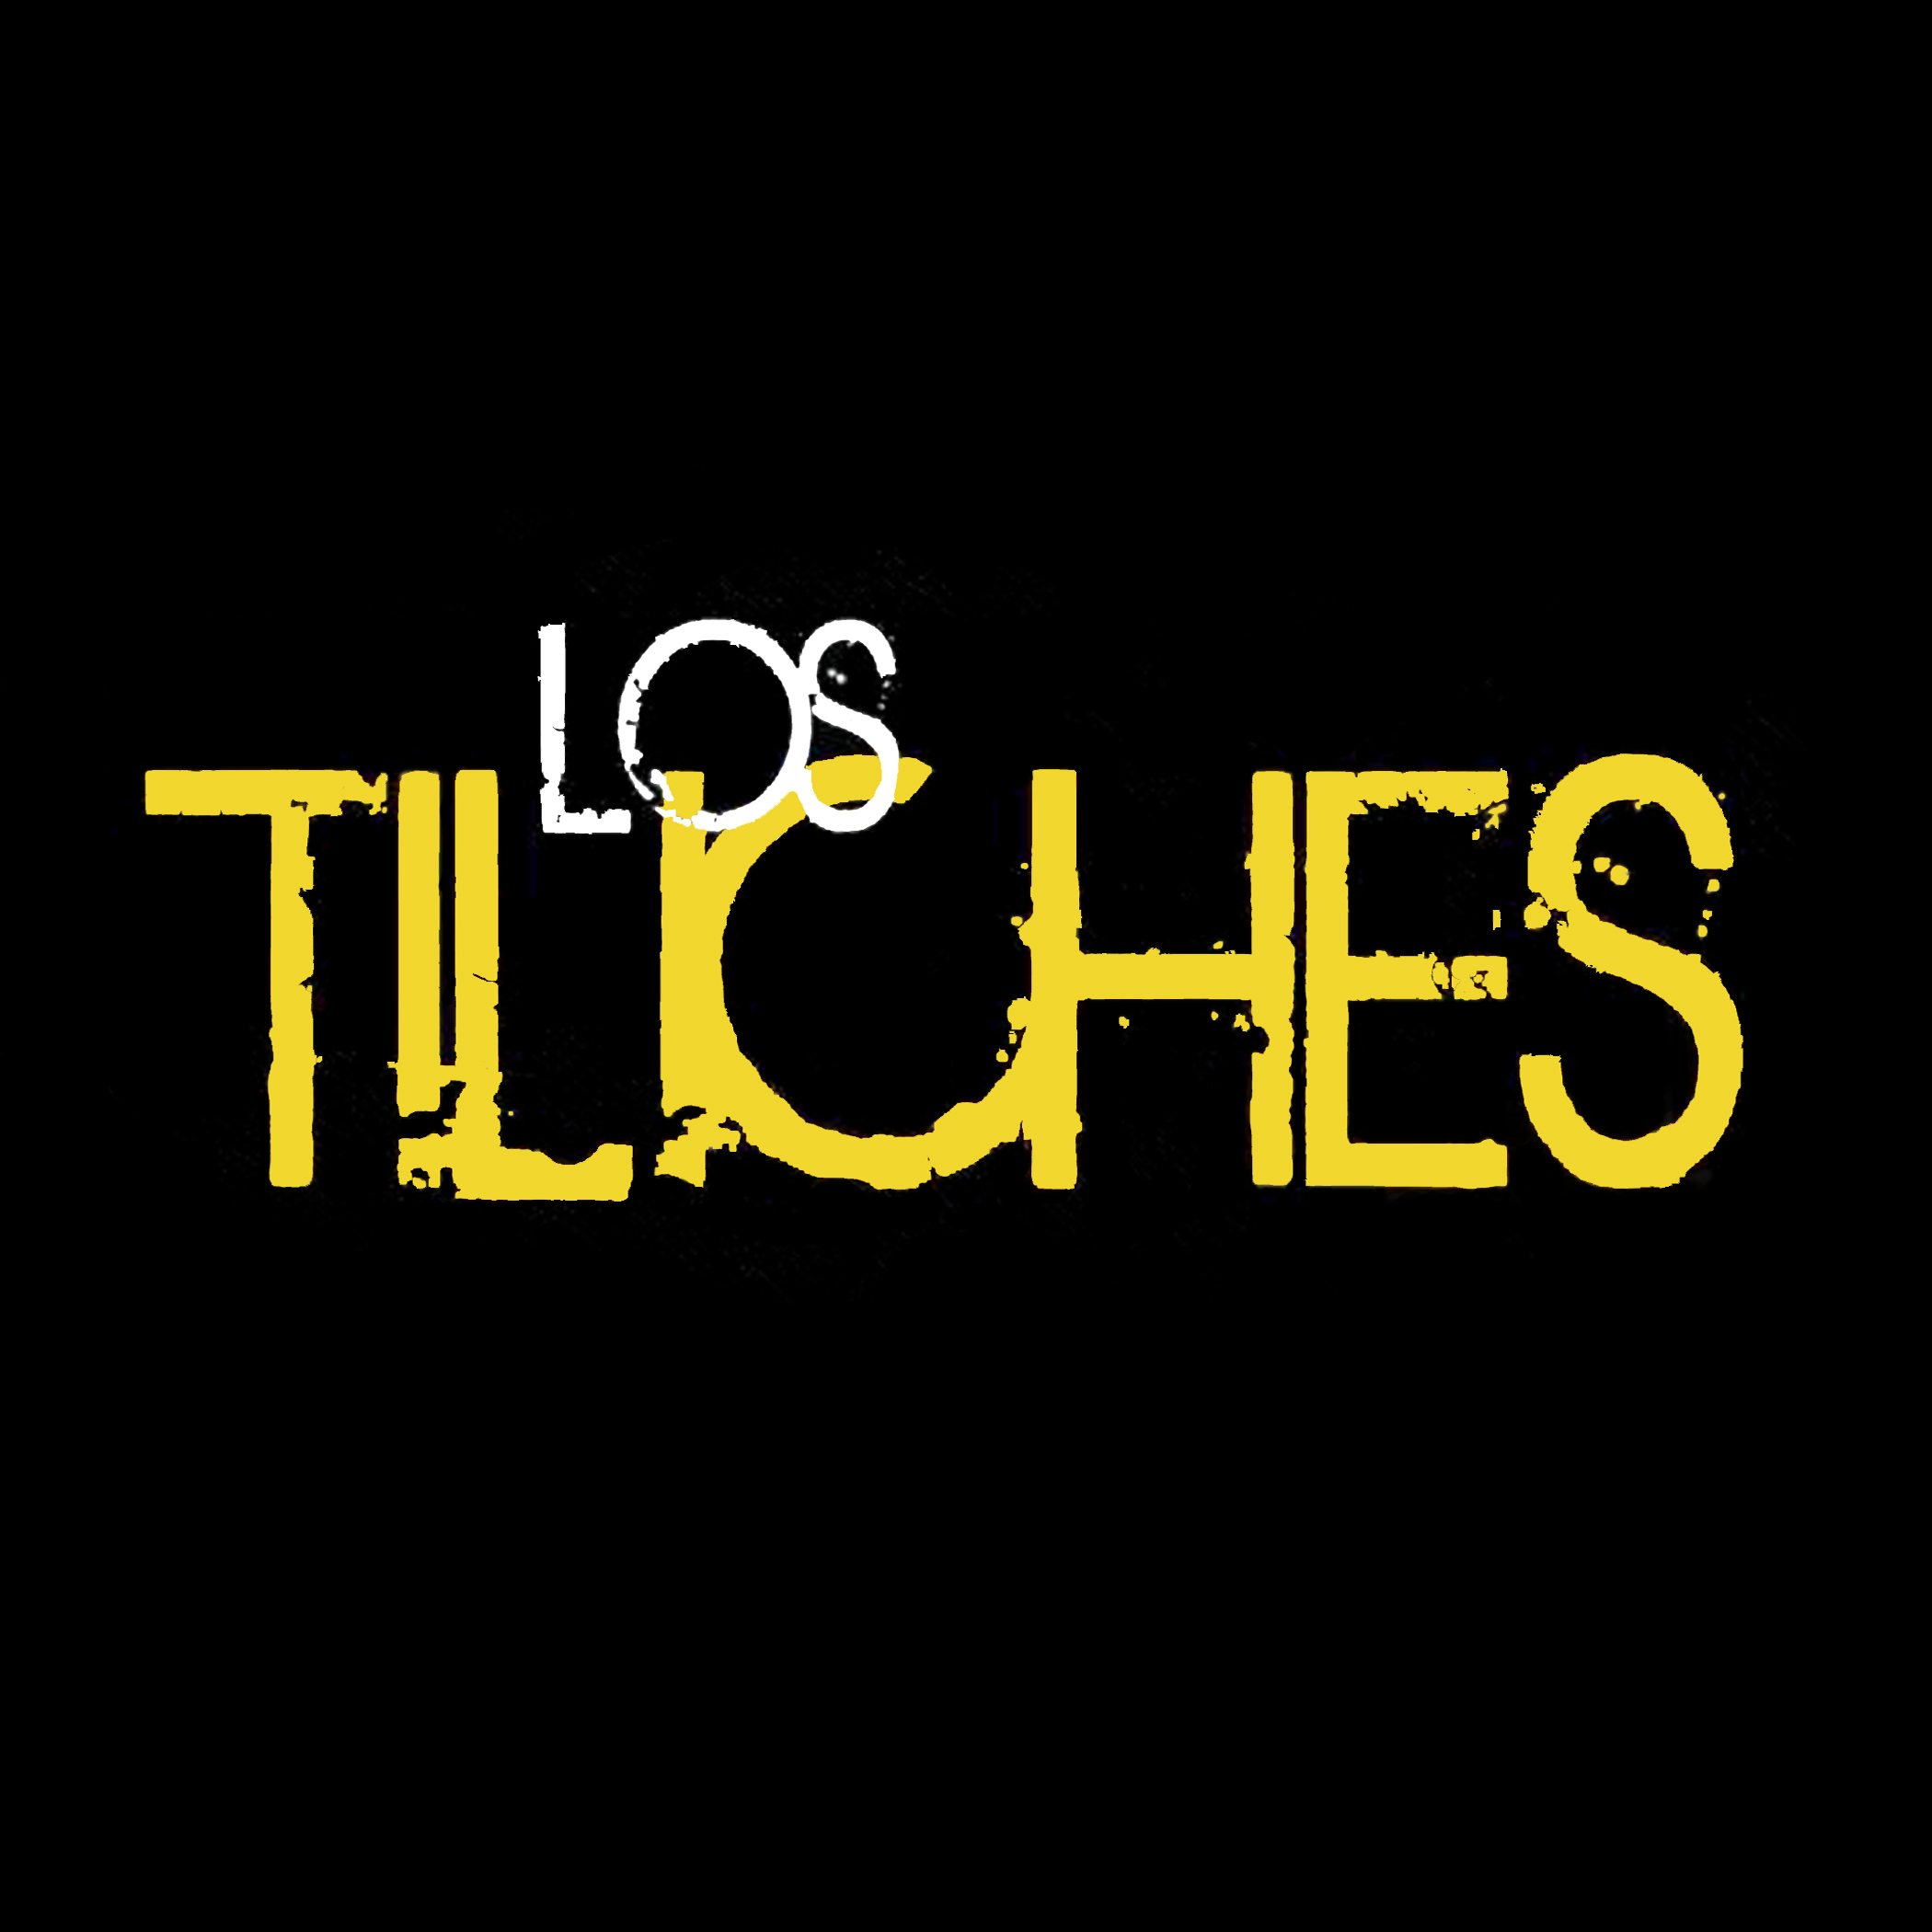 Los Tiliches – No Parare (music download)